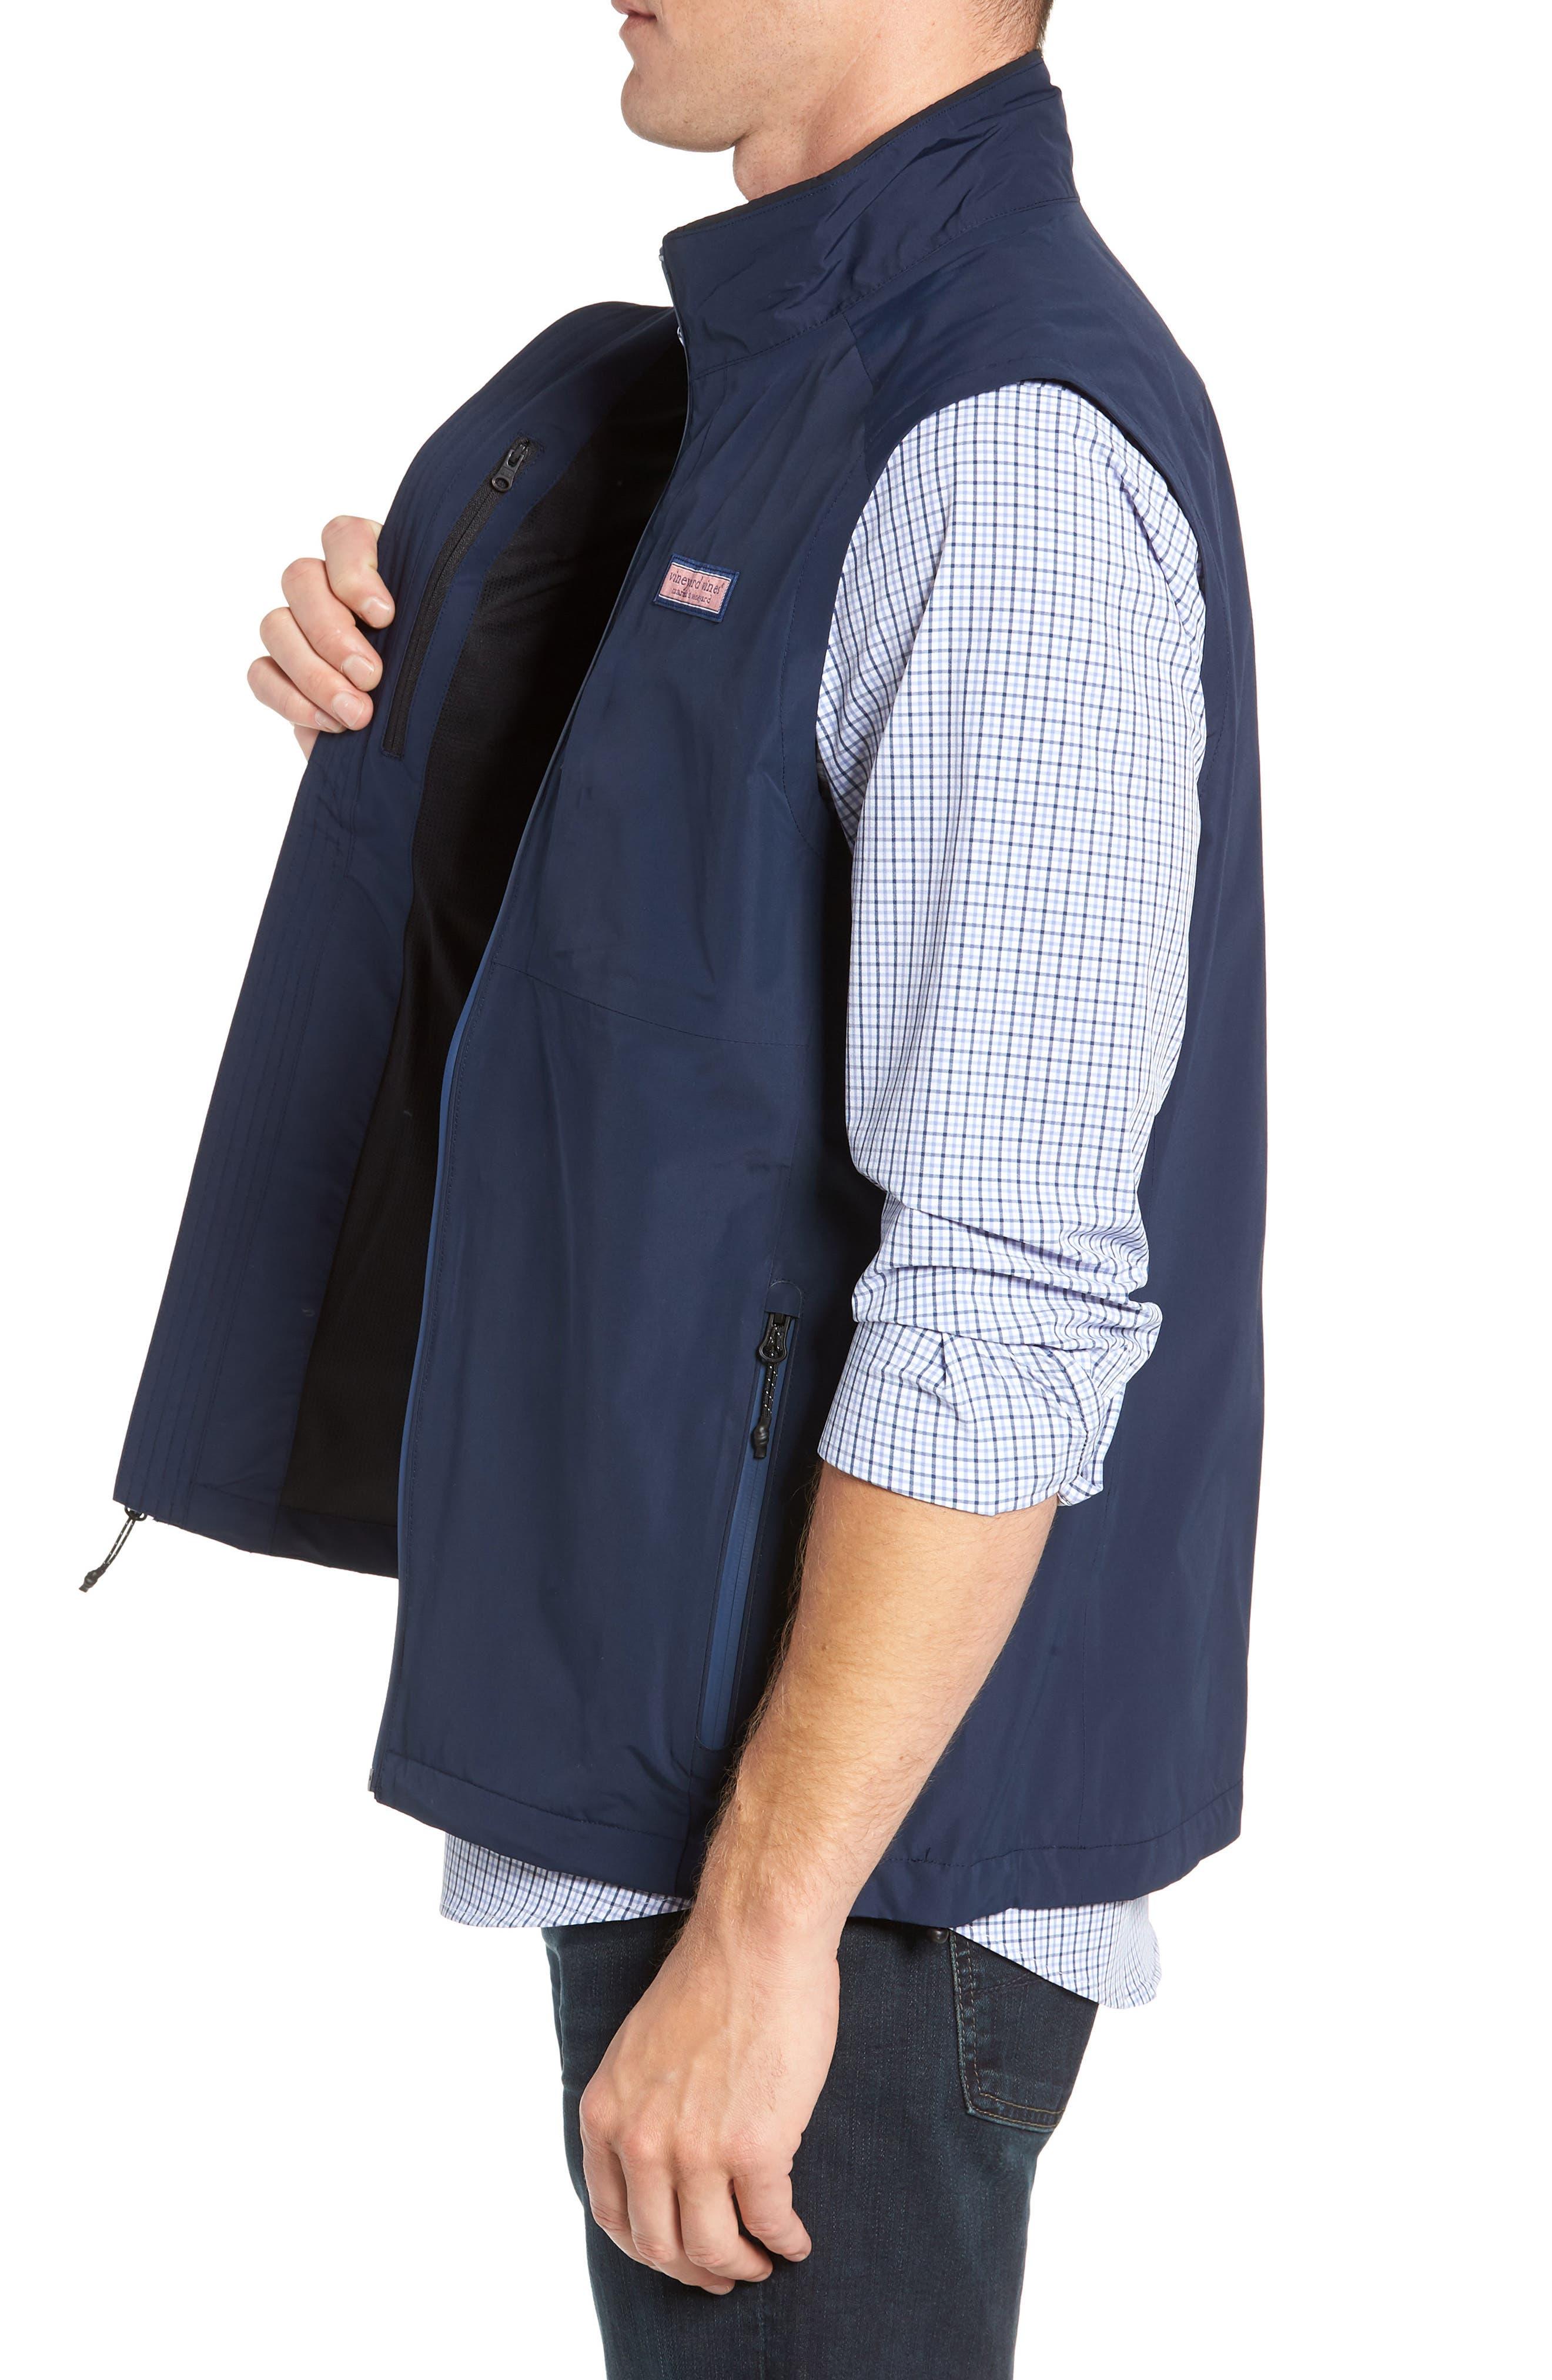 Tech Windbreaker Vest,                             Alternate thumbnail 3, color,                             410